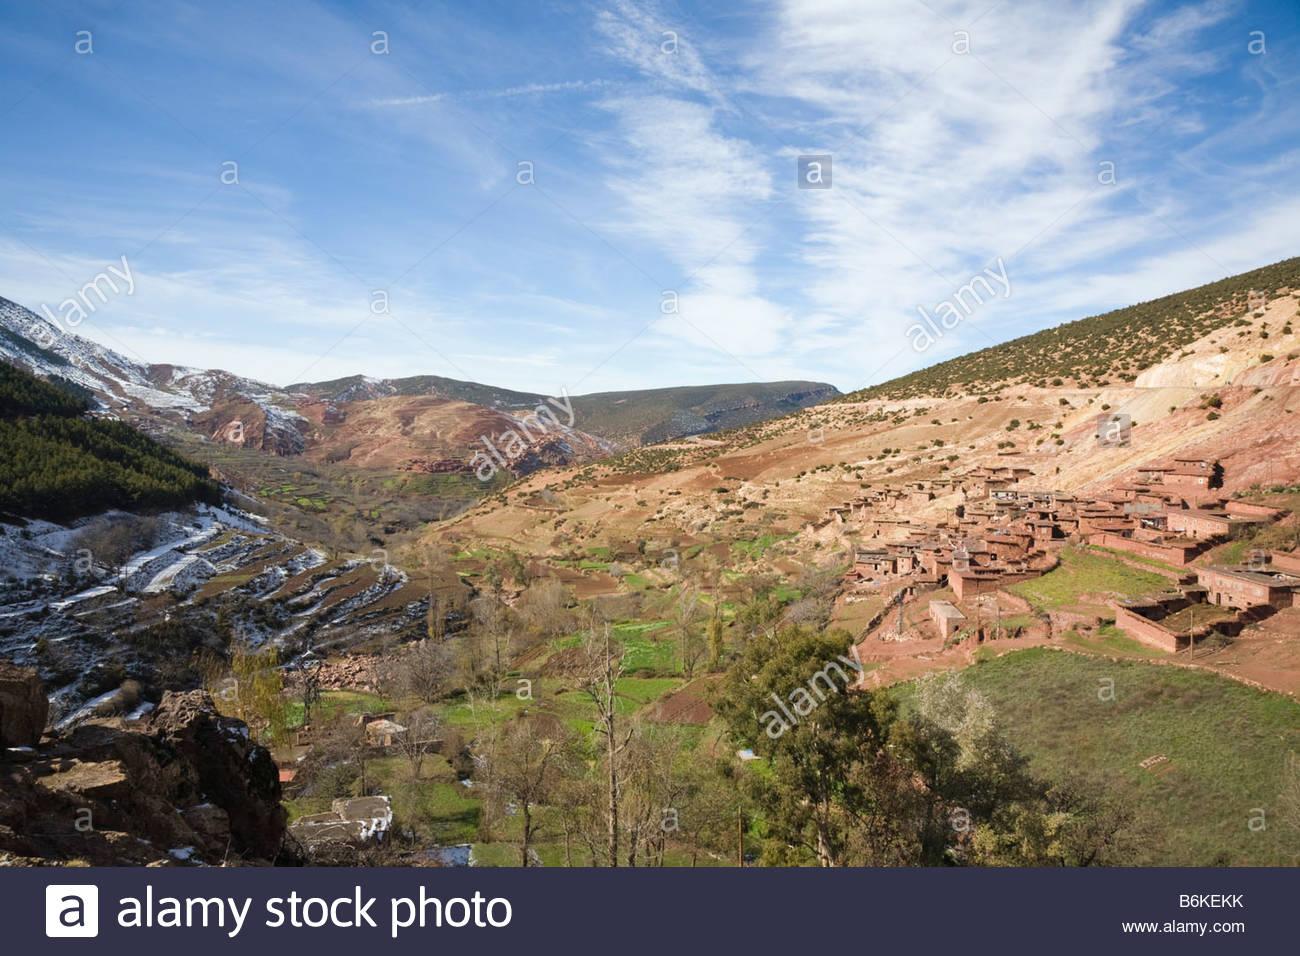 asni tal marokko l ndlichen landschaft mit traditionellen berg berberdorf im hohen atlas gebirge. Black Bedroom Furniture Sets. Home Design Ideas